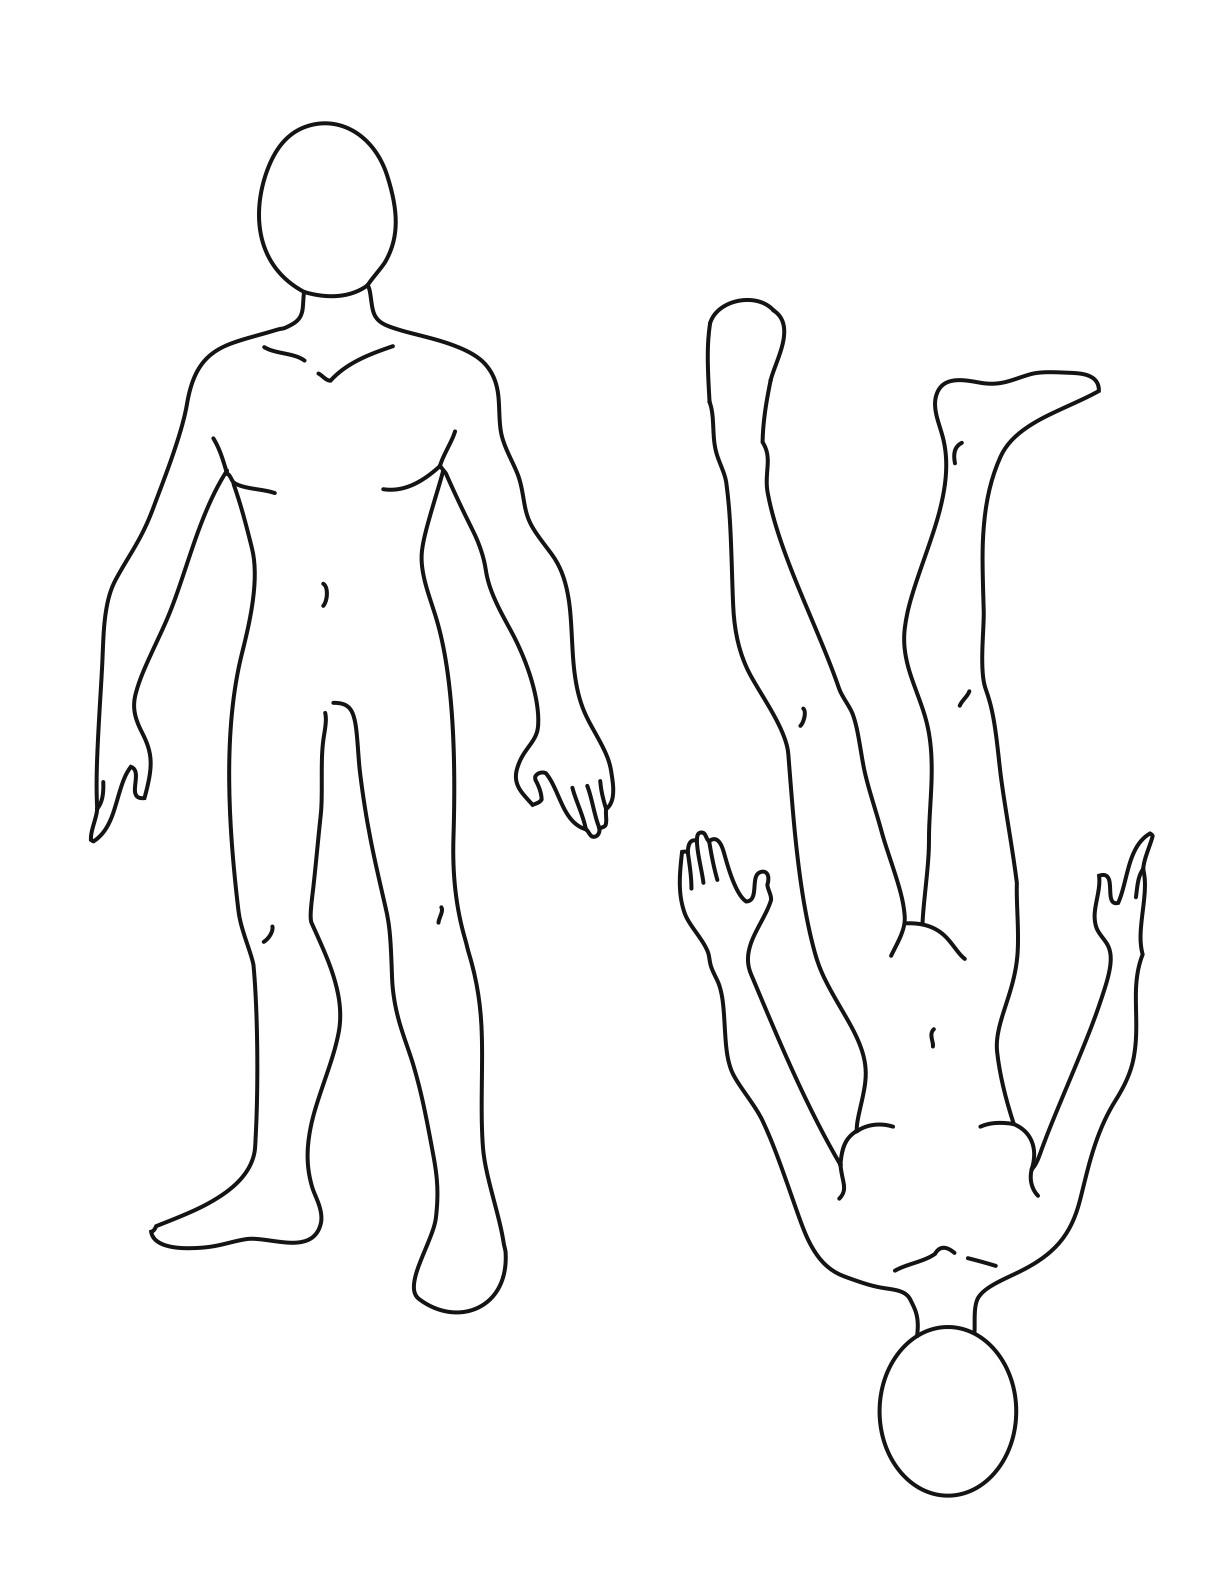 Free Human Body Outline Printable, Download Free Clip Art, Free Clip - Free Printable Human Body Template